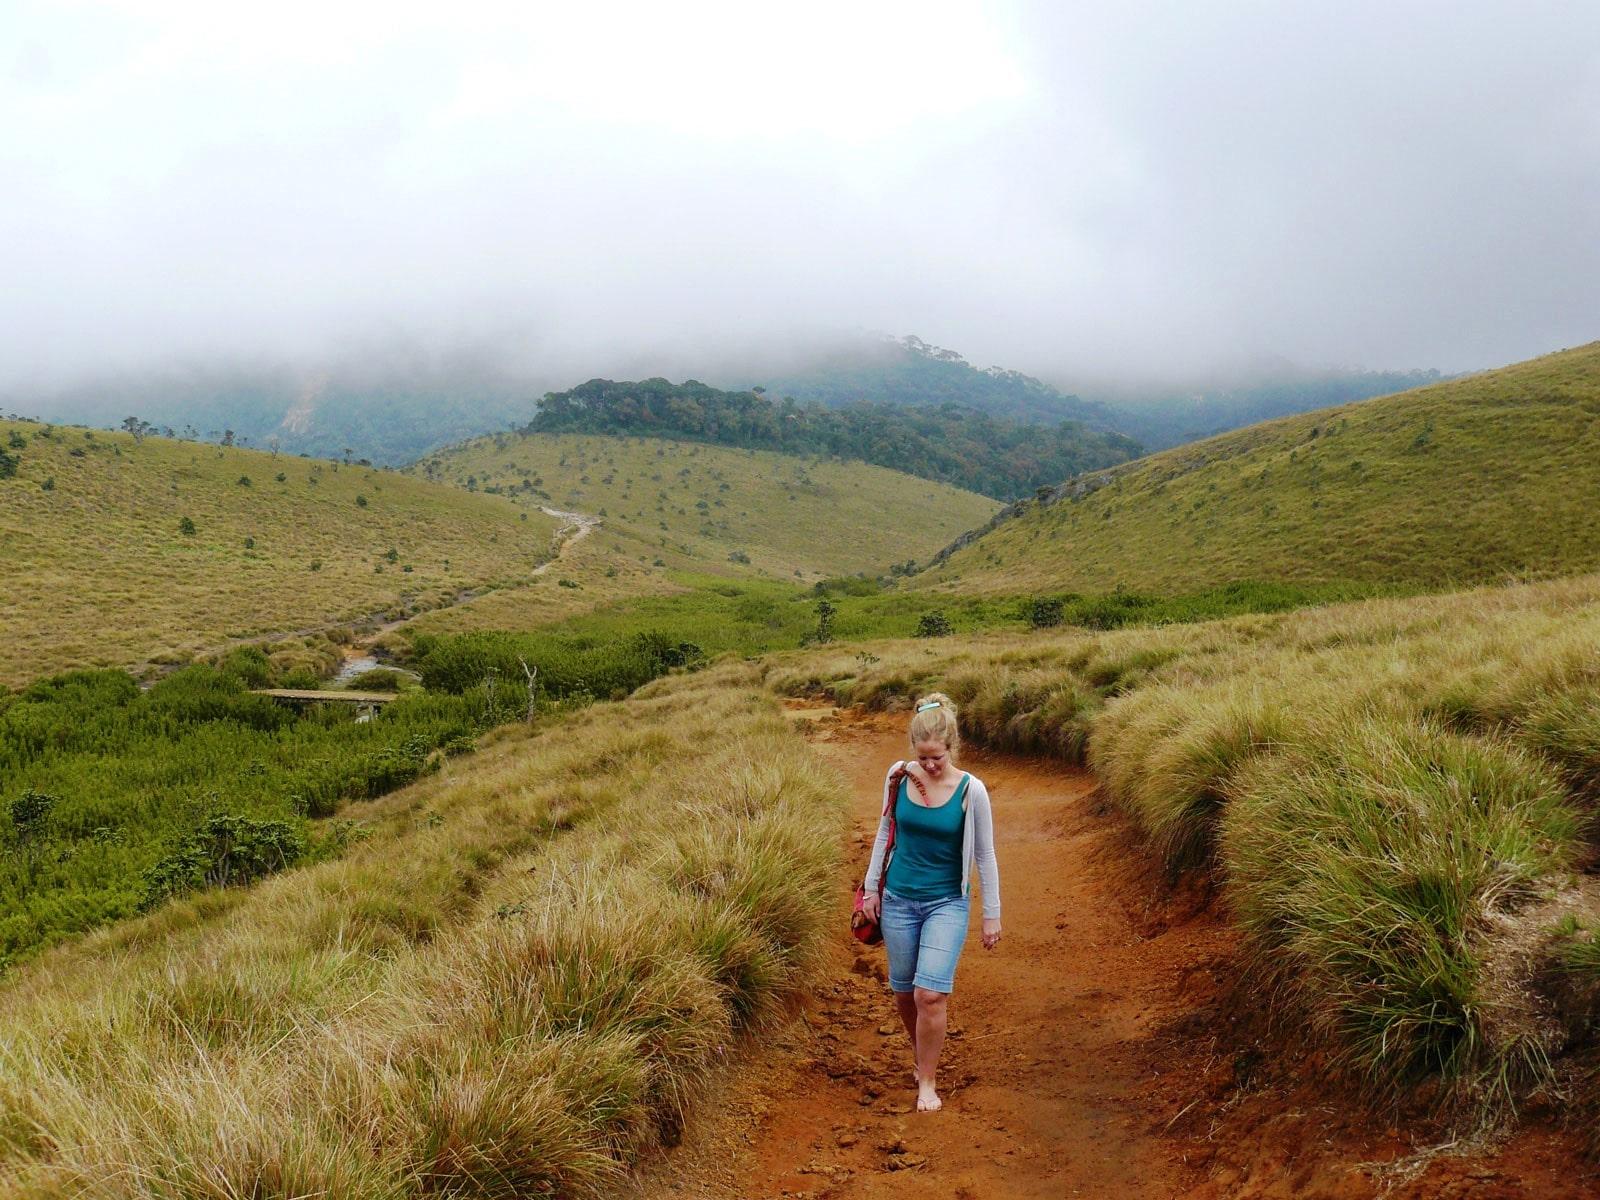 rondreis sri lanka centrale hooglanden blog 2